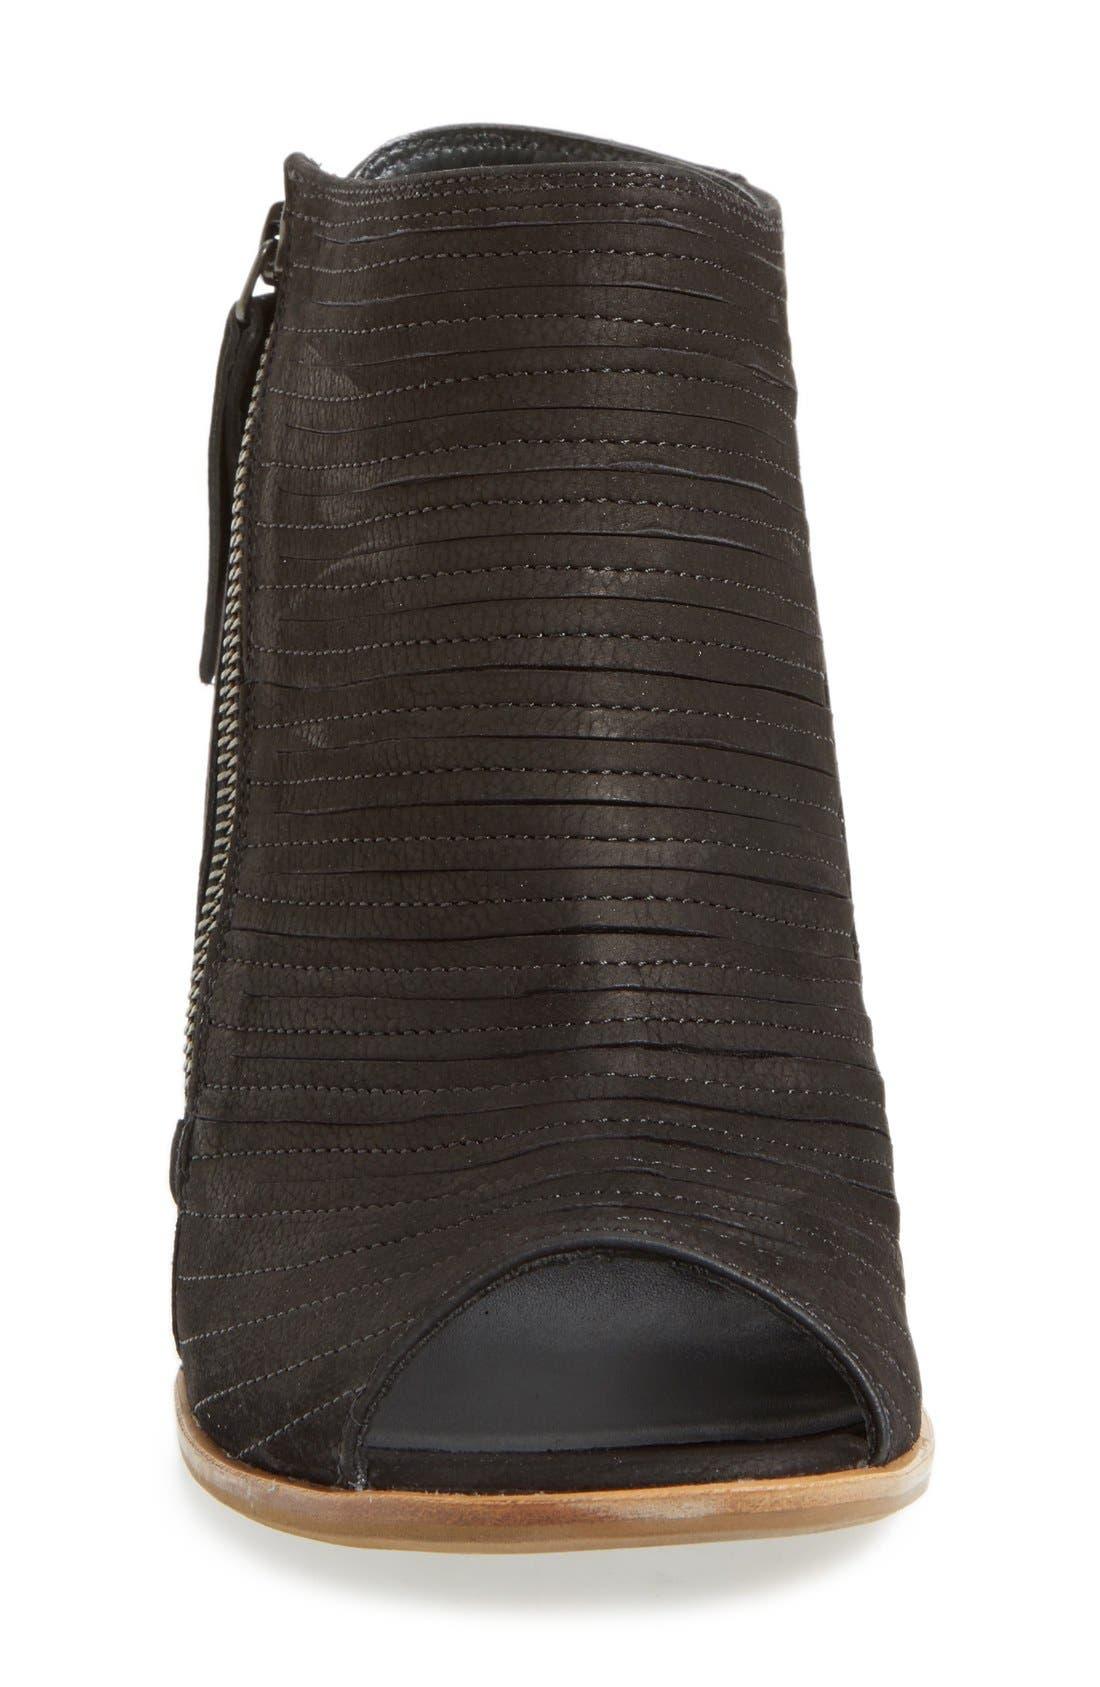 Alternate Image 3  - Paul Green 'Cayanne' Leather Peep Toe Sandal (Women)